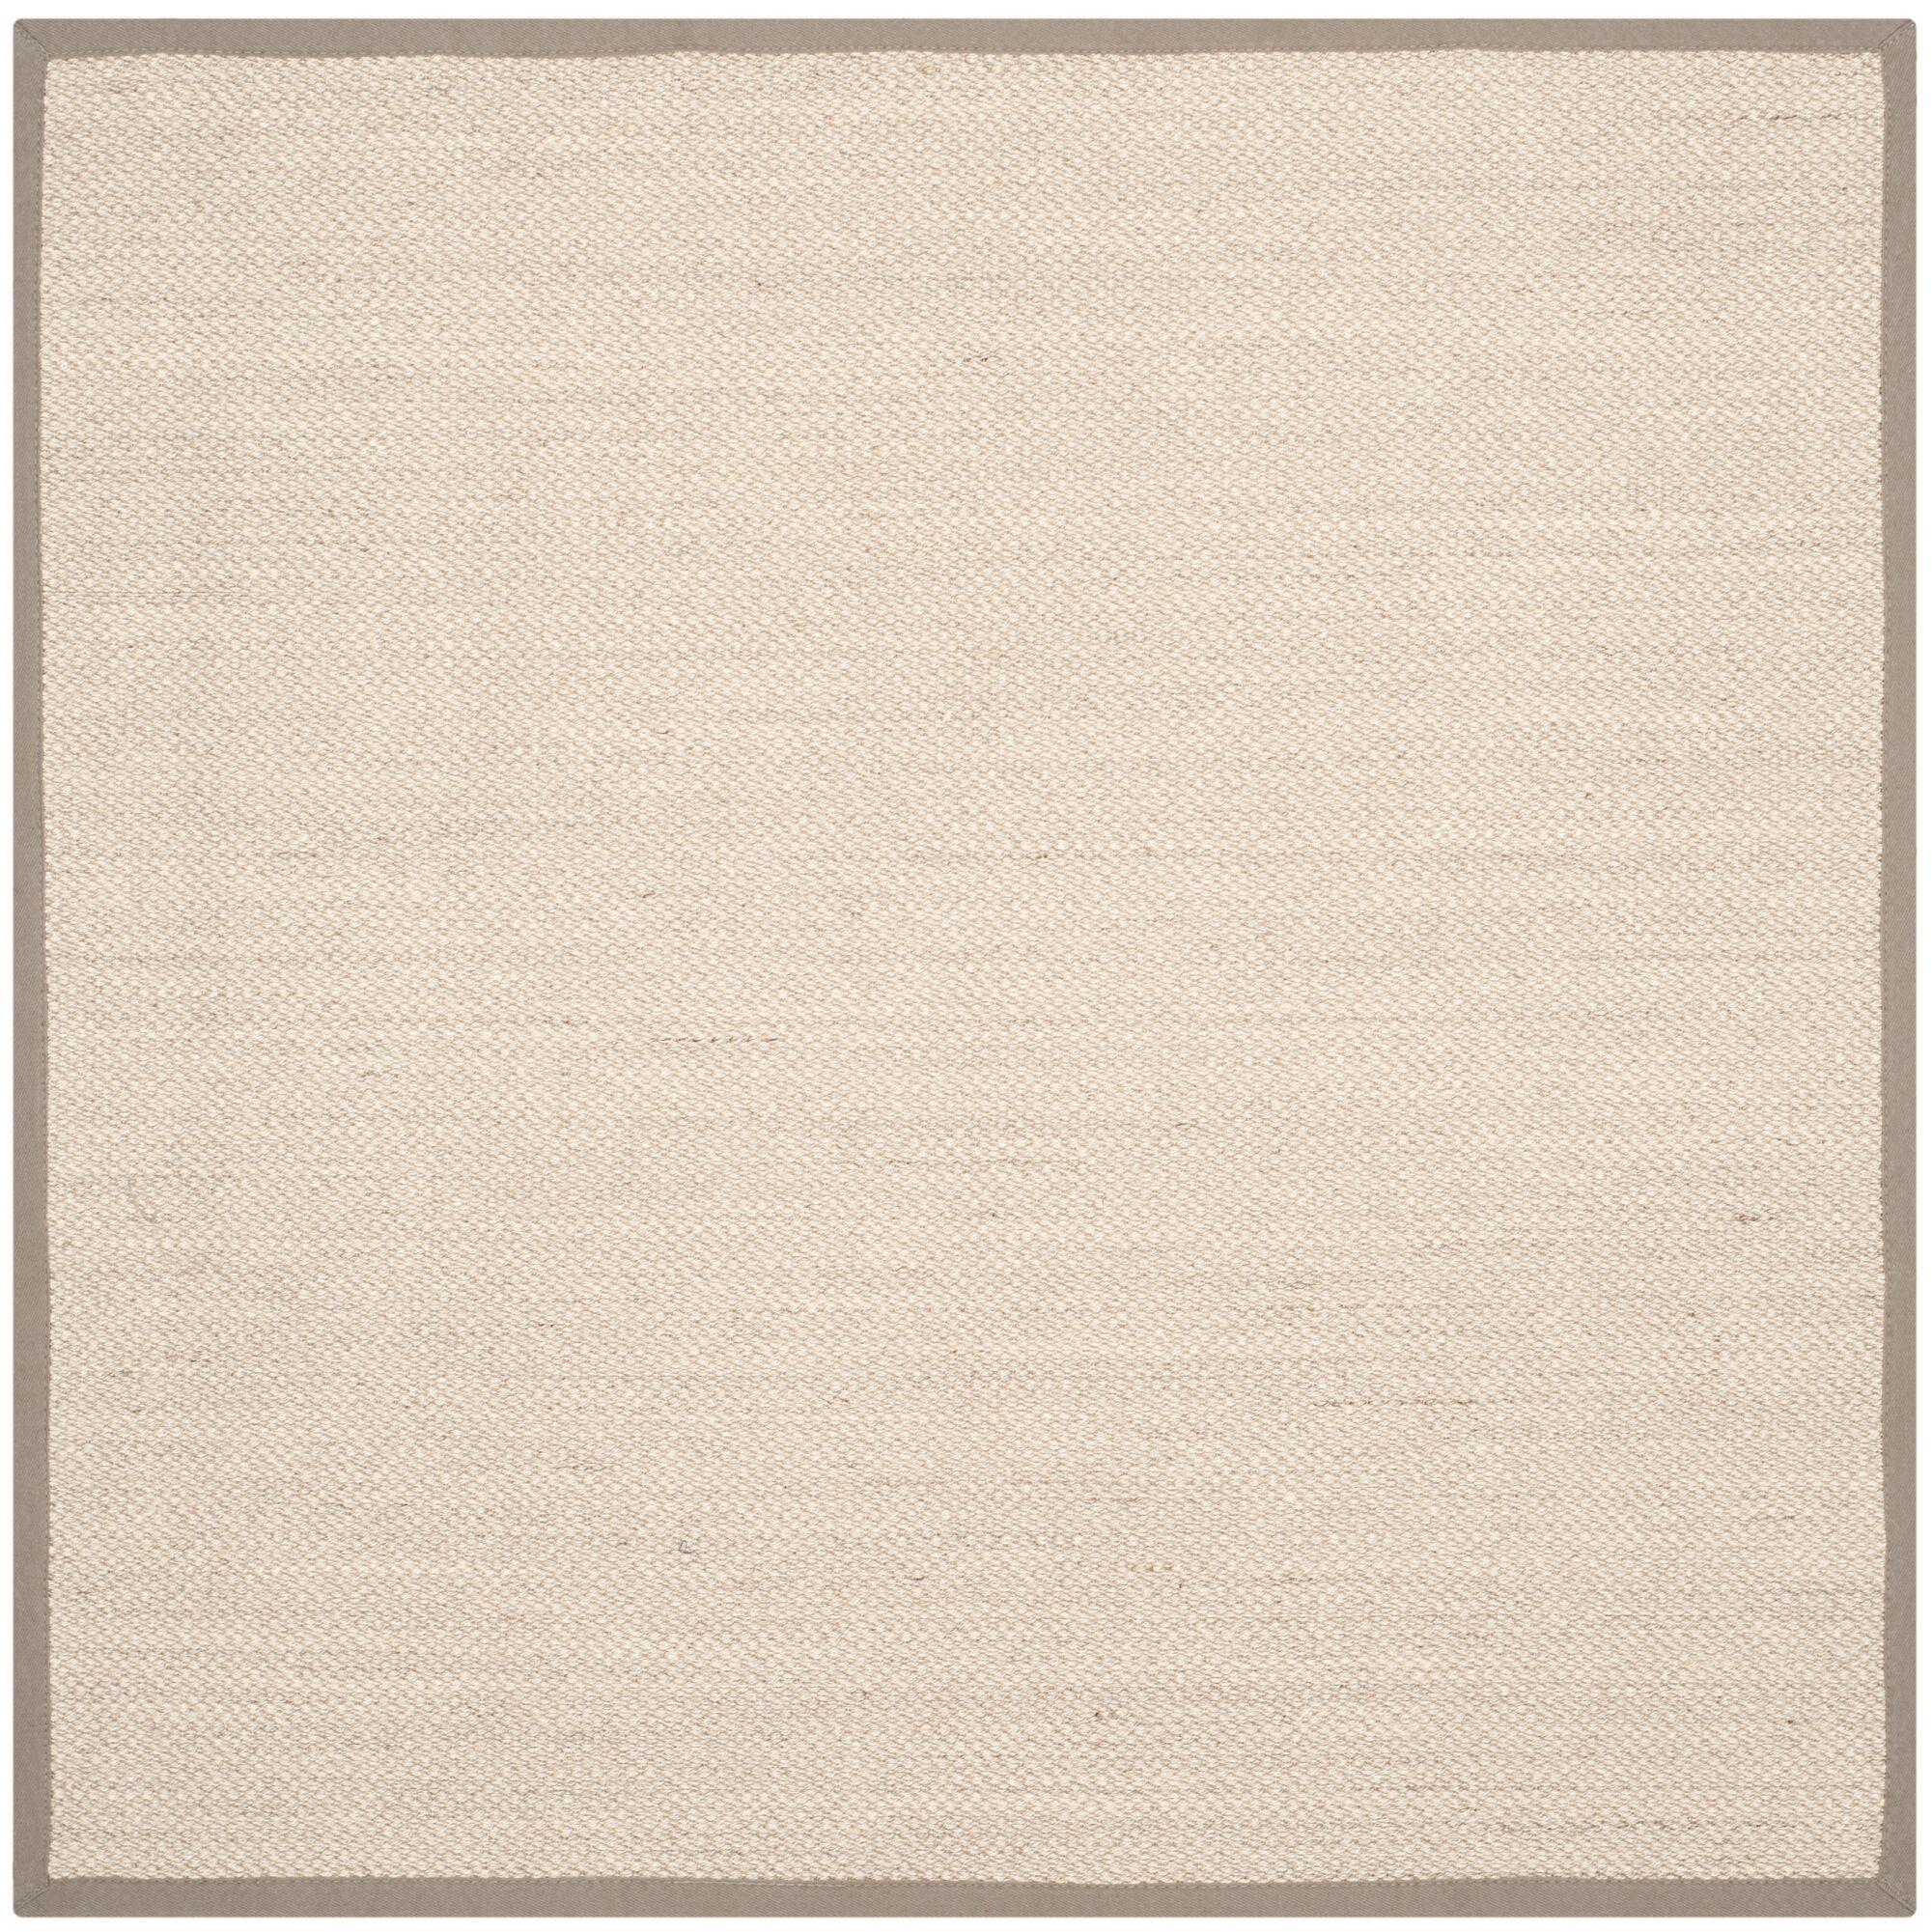 Monadnock Marble/Khaki Area Rug Rug Size: Square 6'